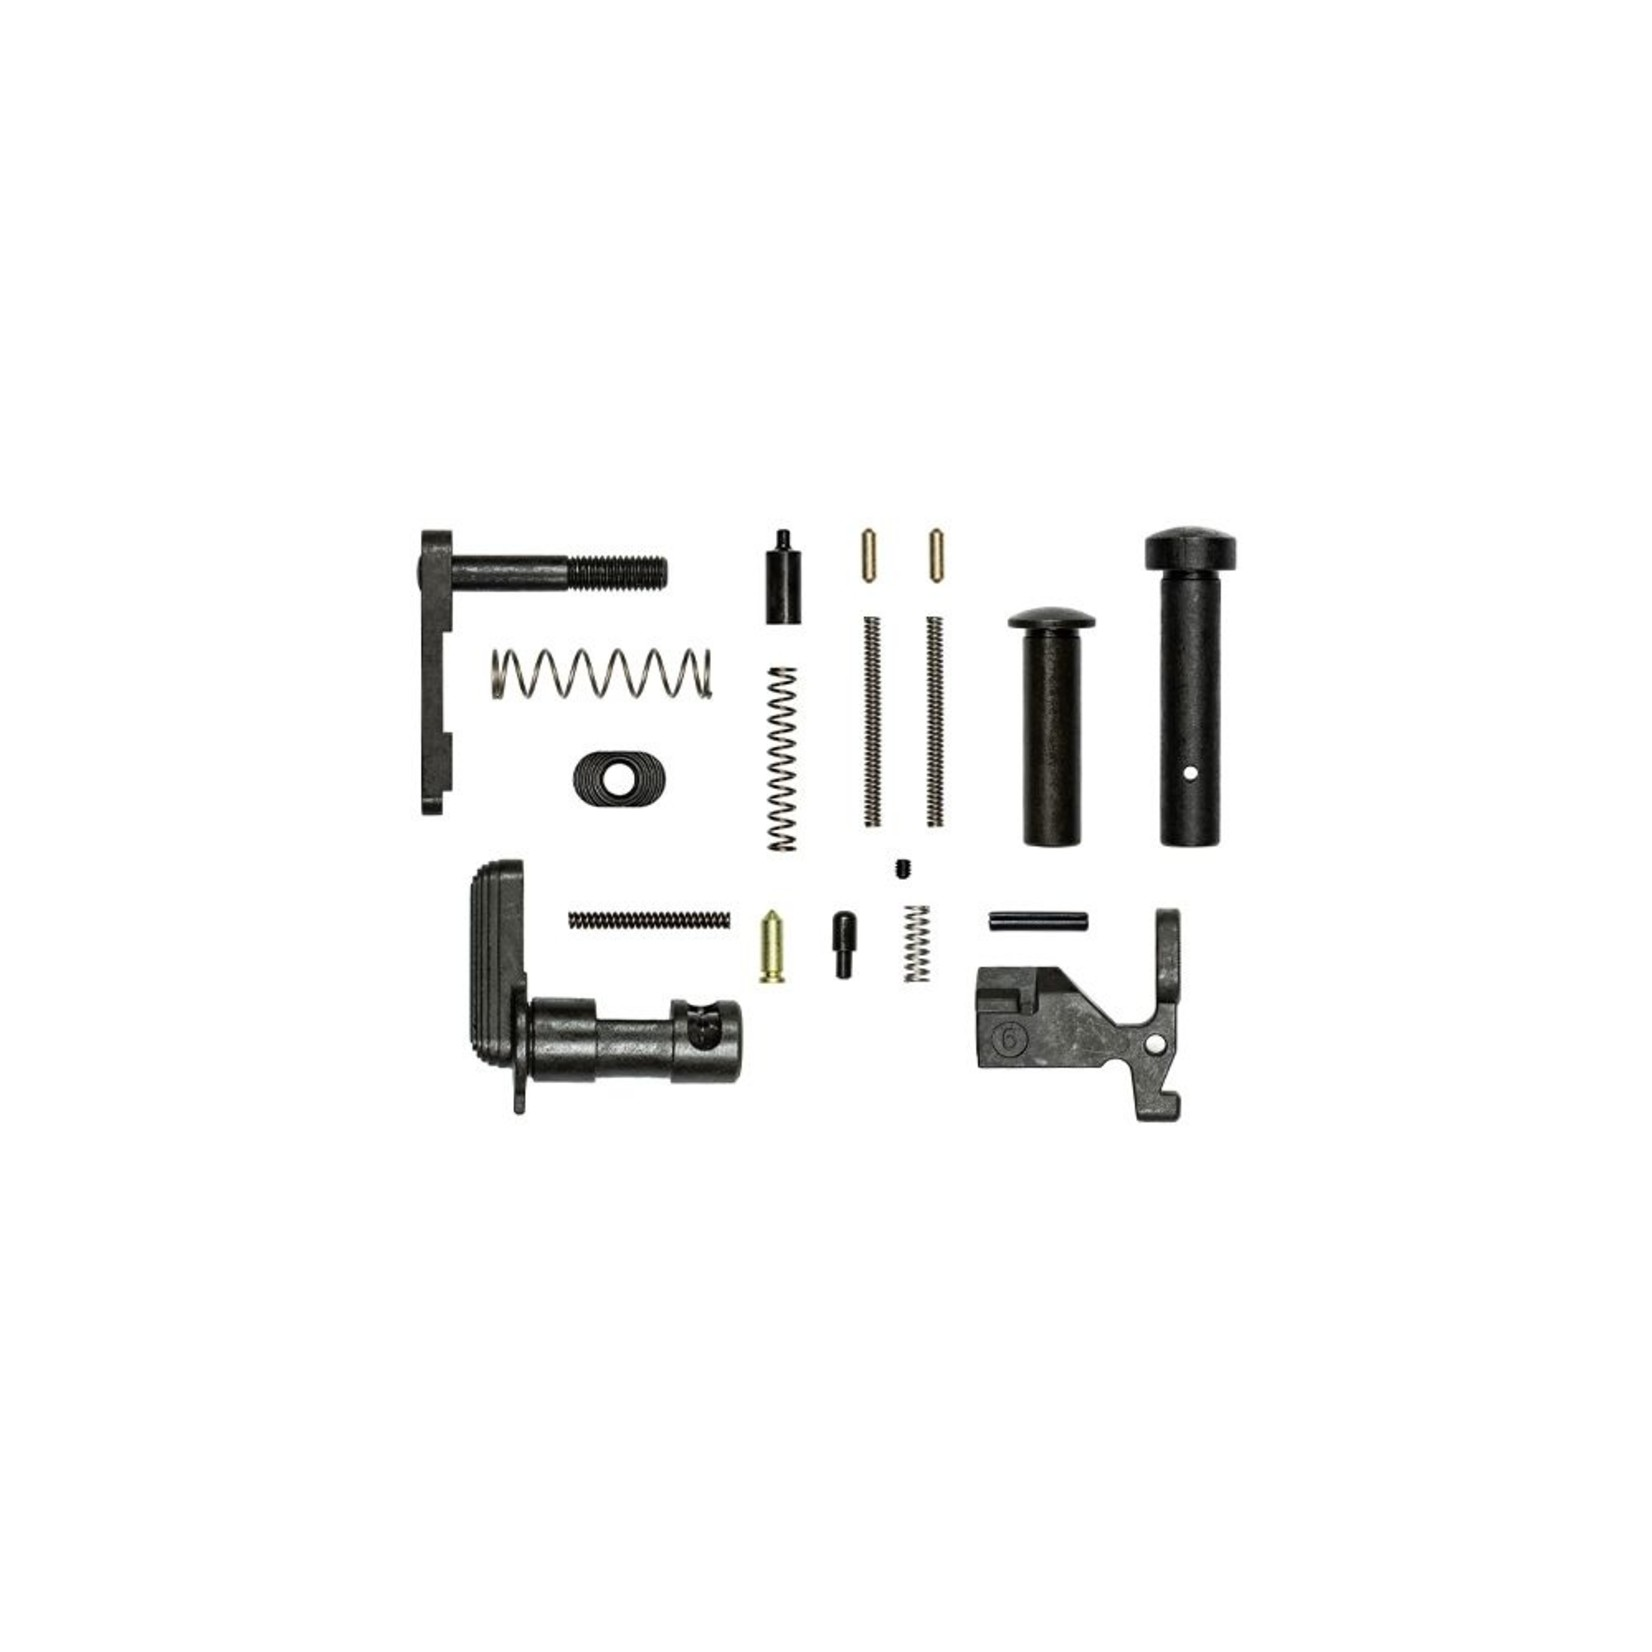 Aero AR15 Lower Parts Kit, Minus FCG/Trigger Guard/Pistol Grip, Aero Precision